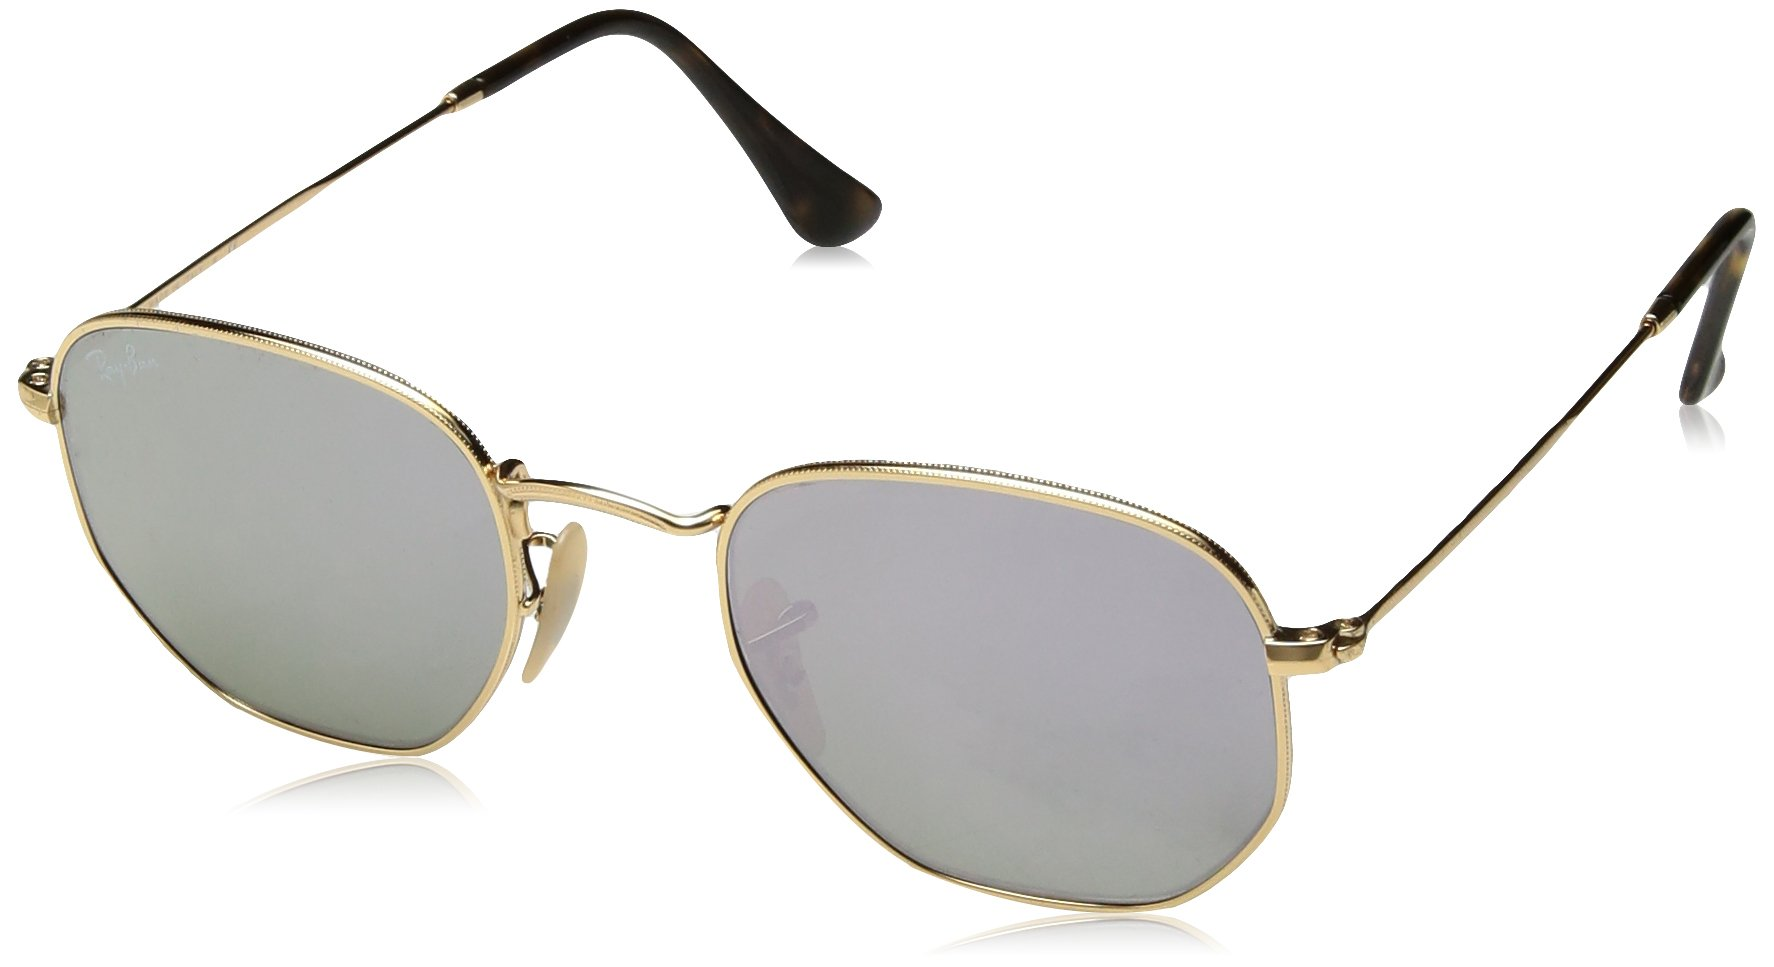 Ray-Ban RB3548N 001/8O Non-Polarized Hexagonal Sunglasses, Gold/Lilac Mirror, 48 mm